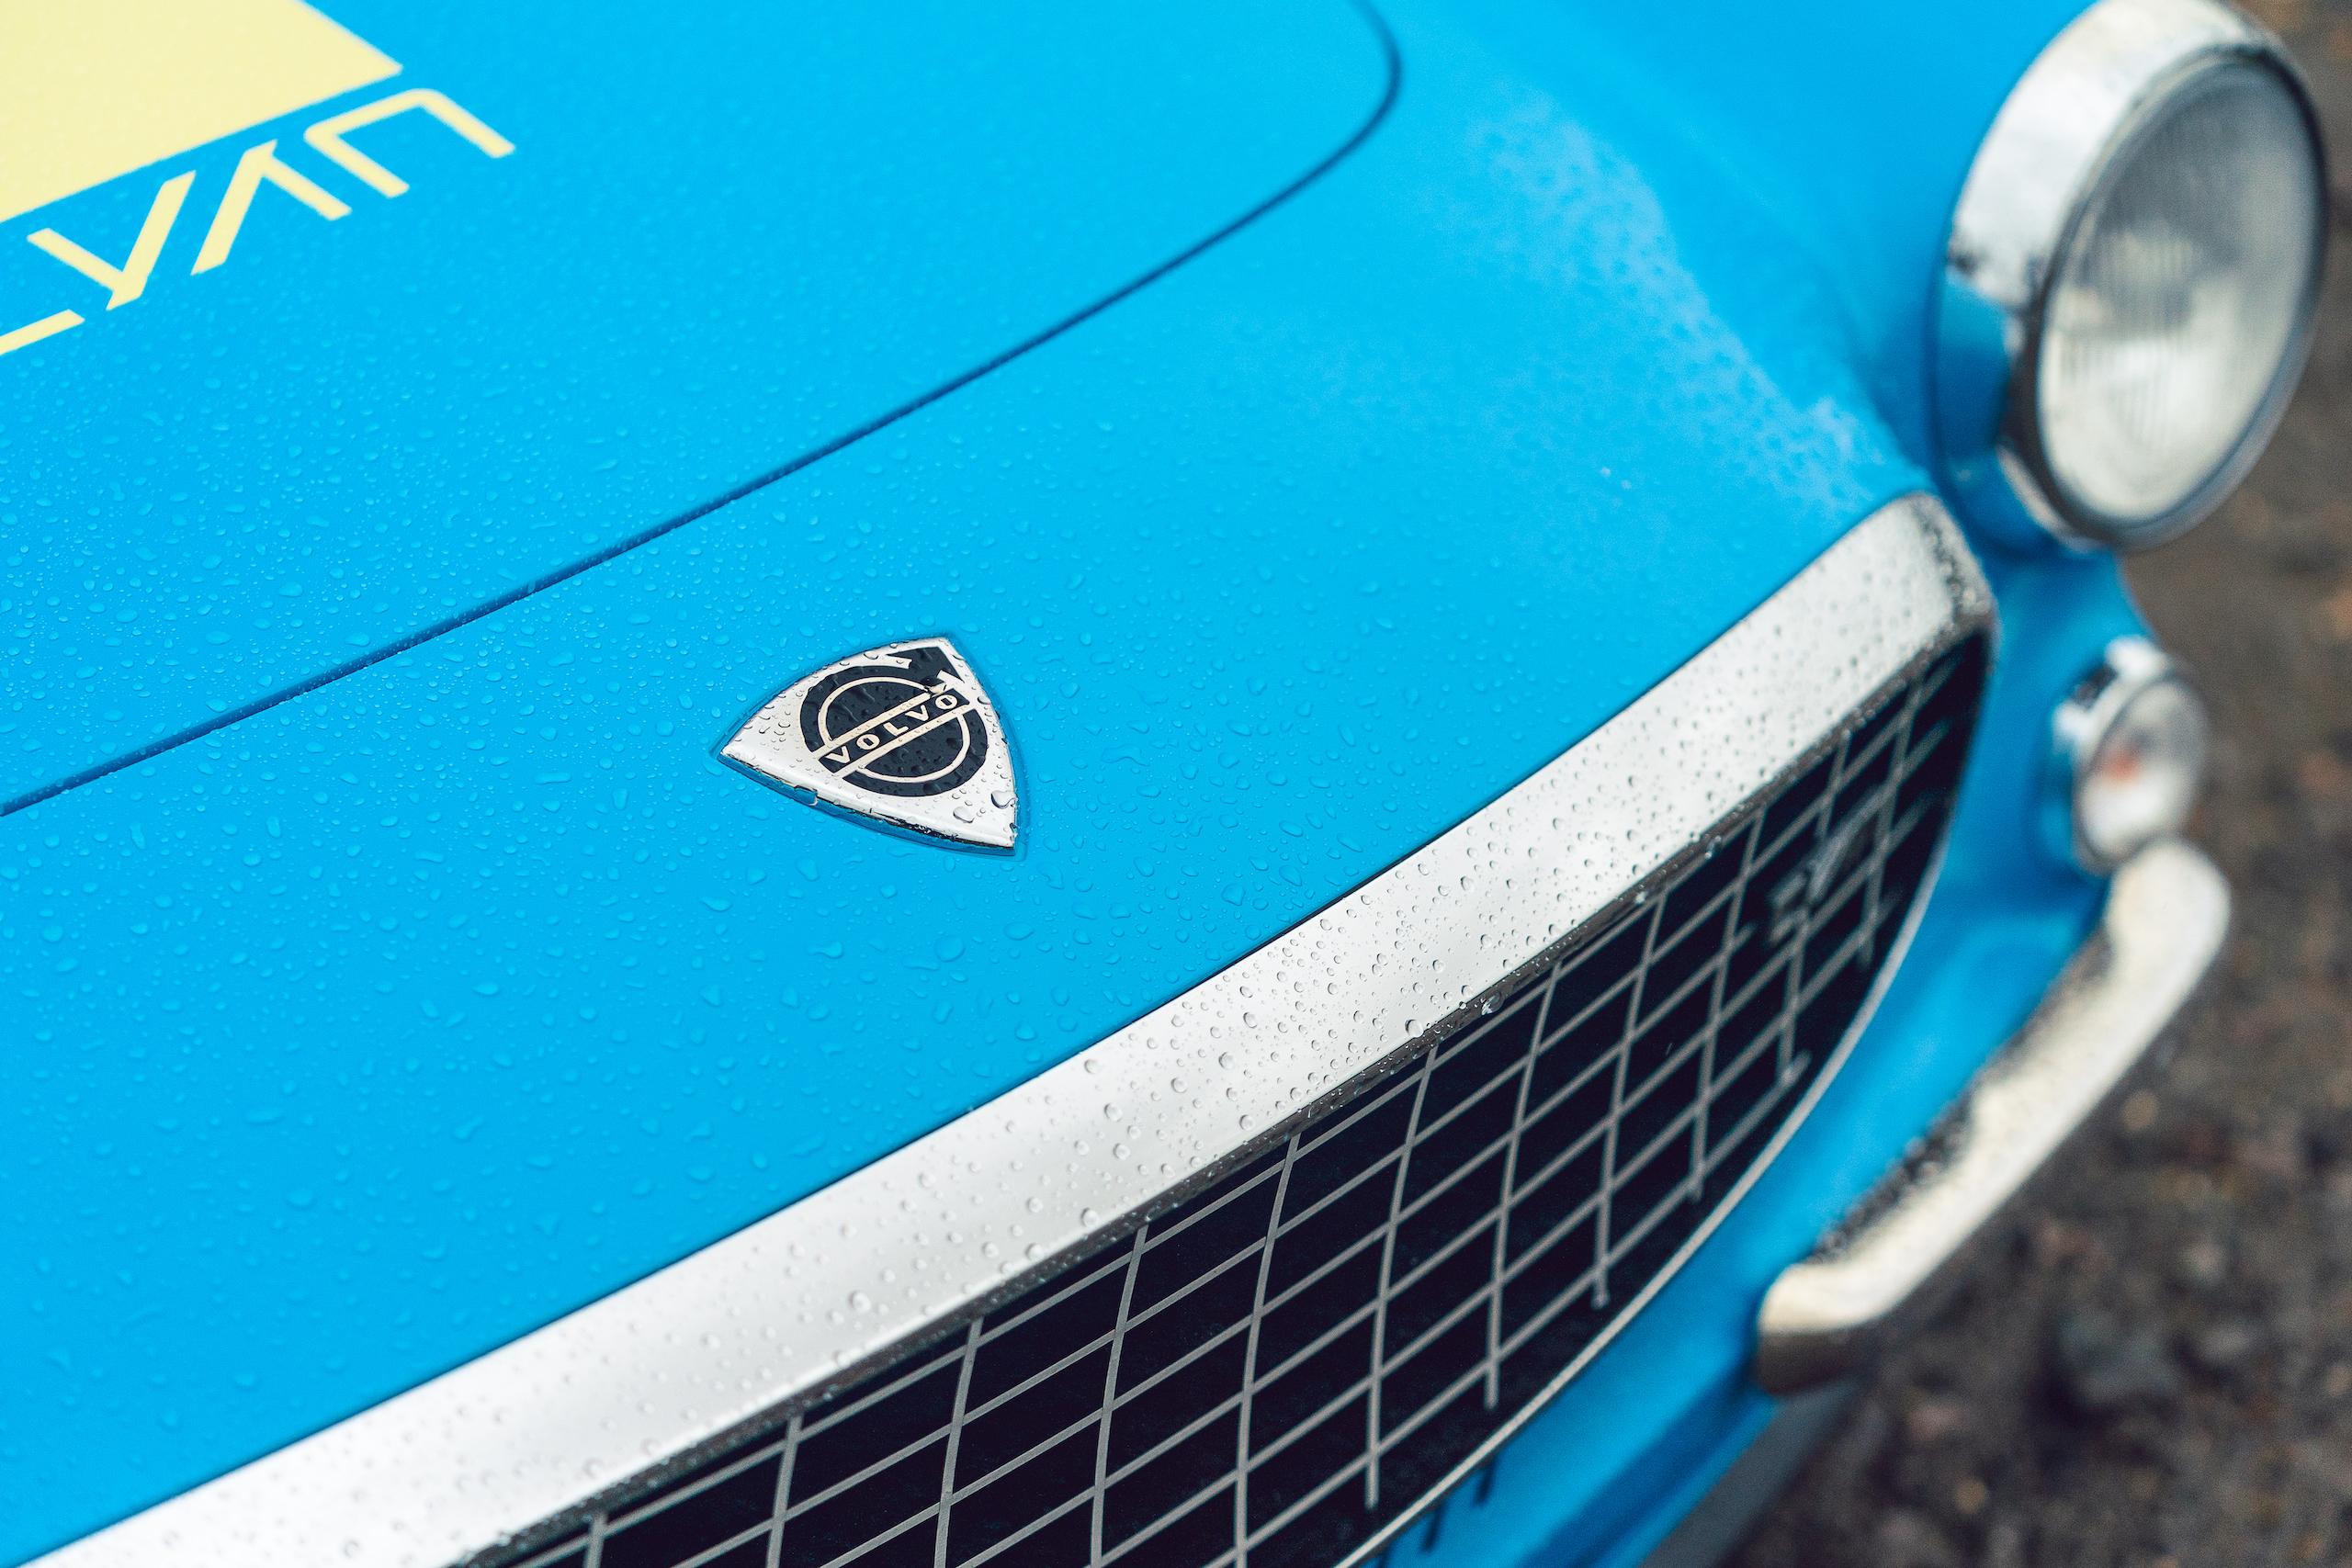 CYAN RACING P1800 front logo badge